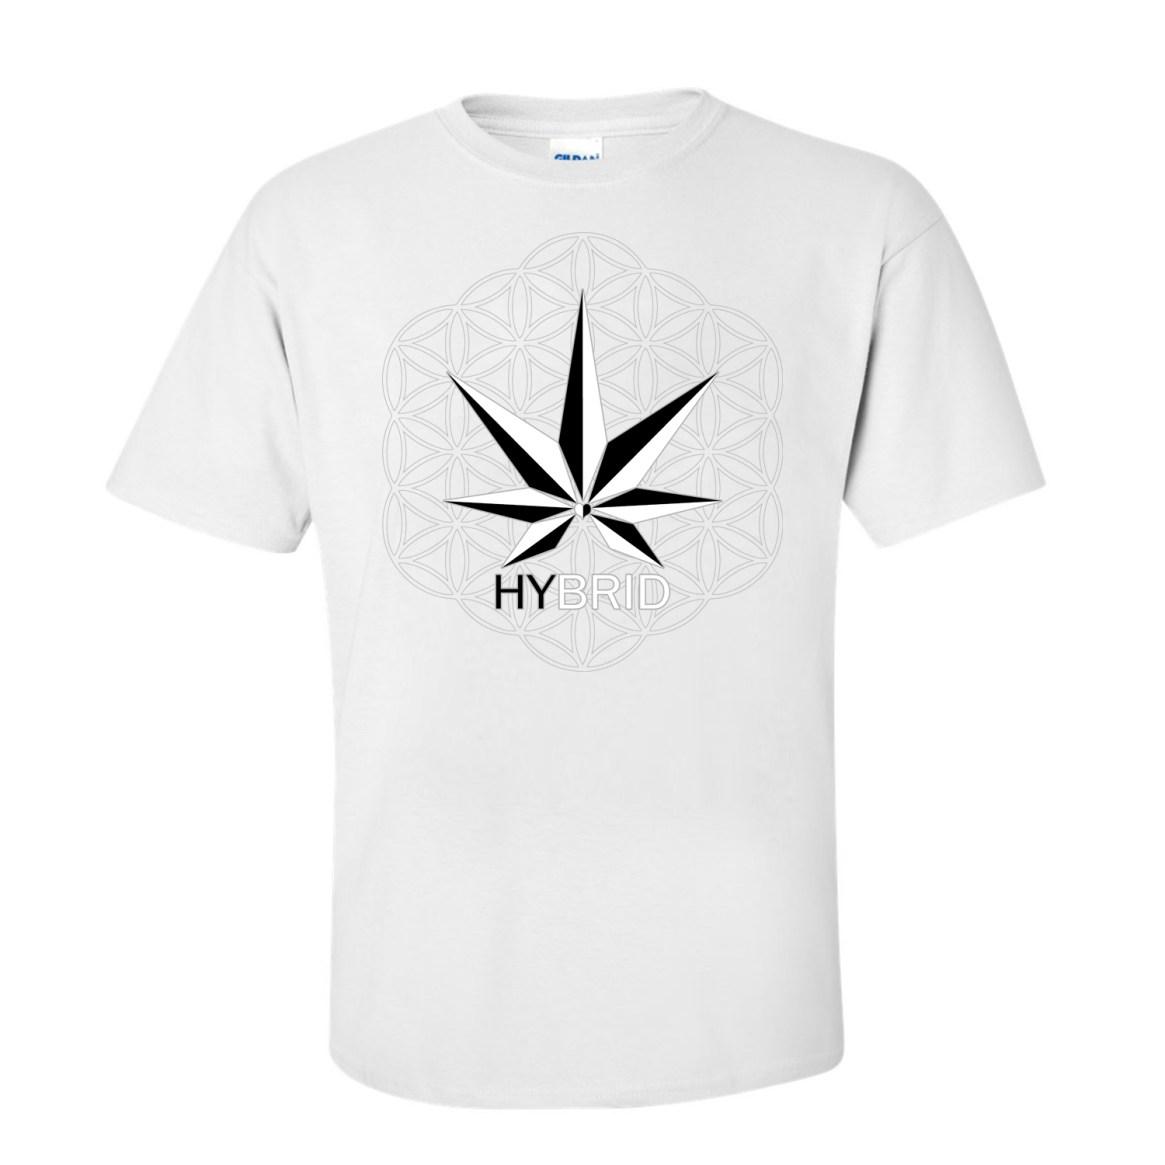 h3mp shirts_HYBRID_WHITE